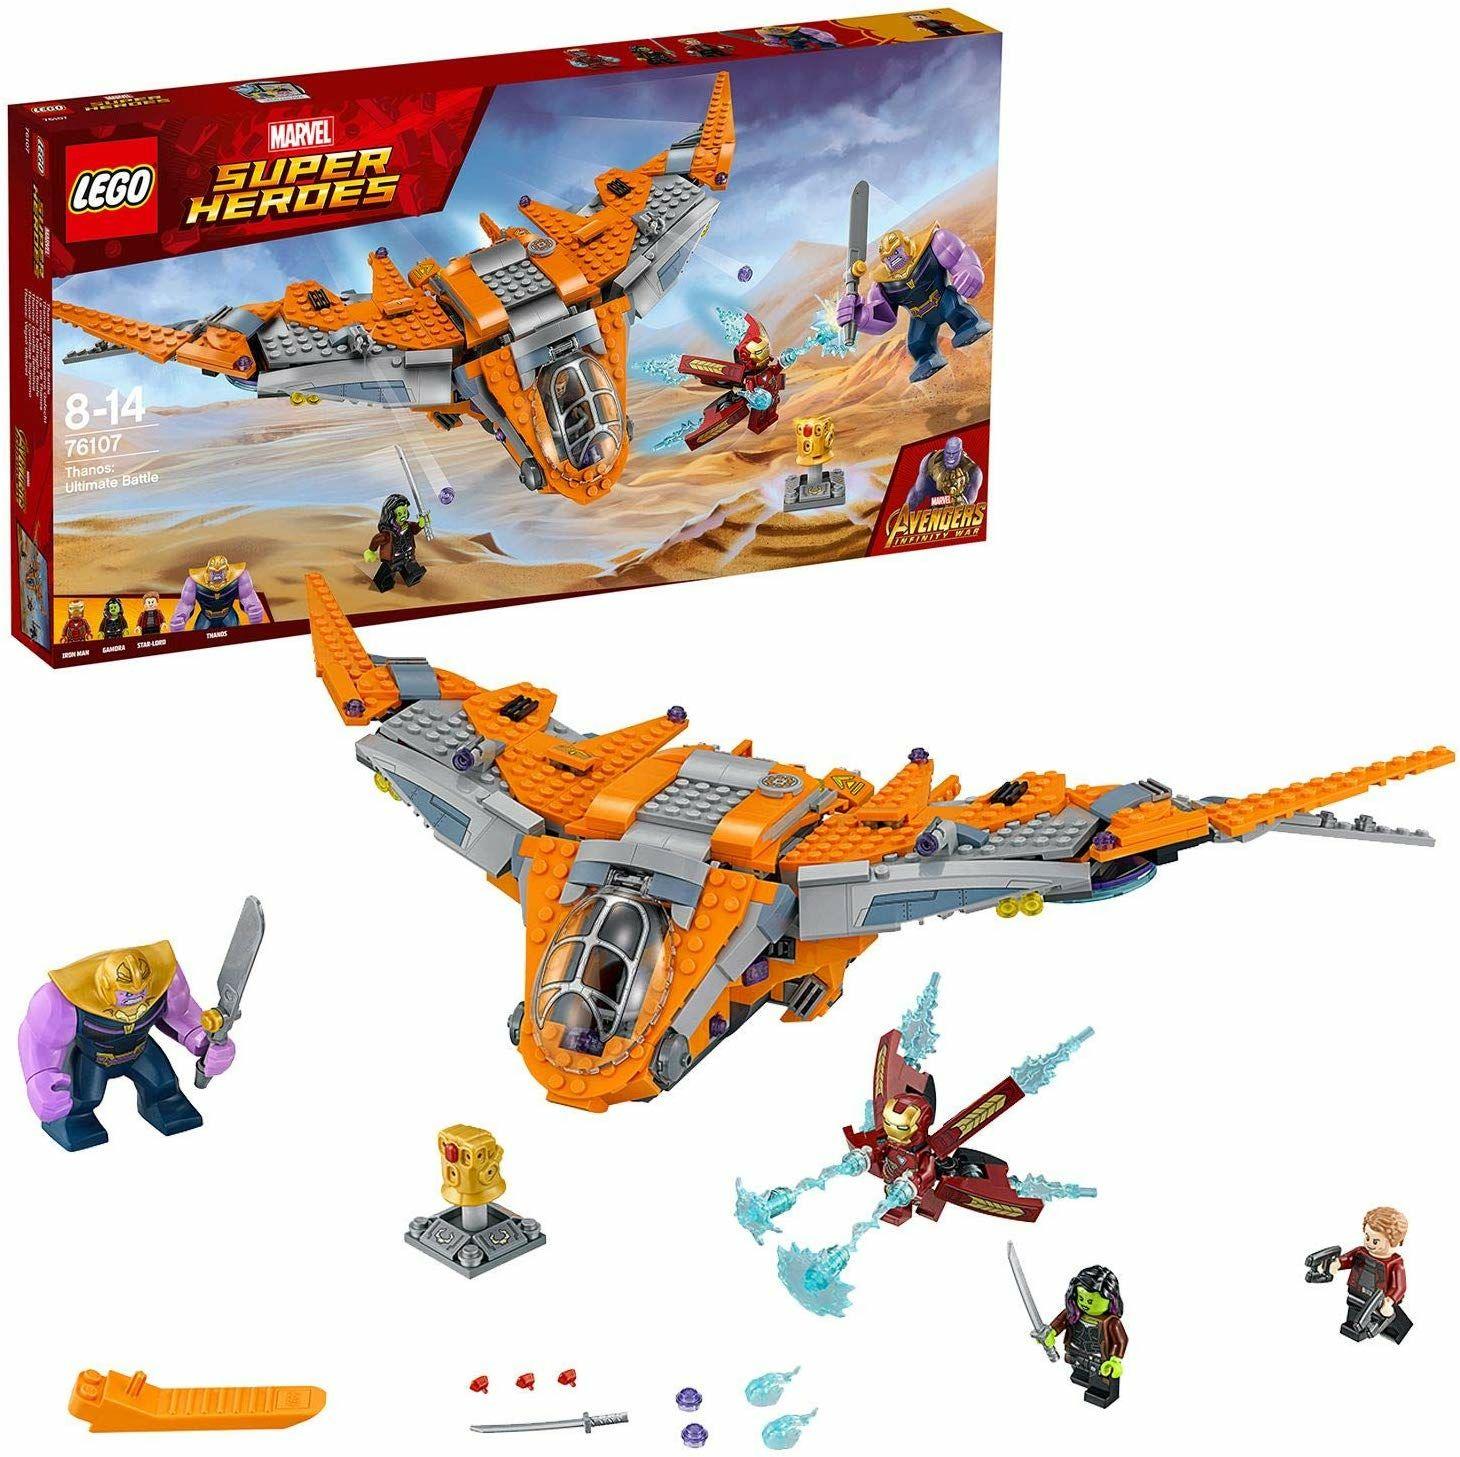 LEGO 76107 Marvel Avengers Thanos Ultimate Battle, Guardian's Ship, Iron Man, Star-Lord, Gamora, Thanos Action Figures - £45.99 @ Amazon